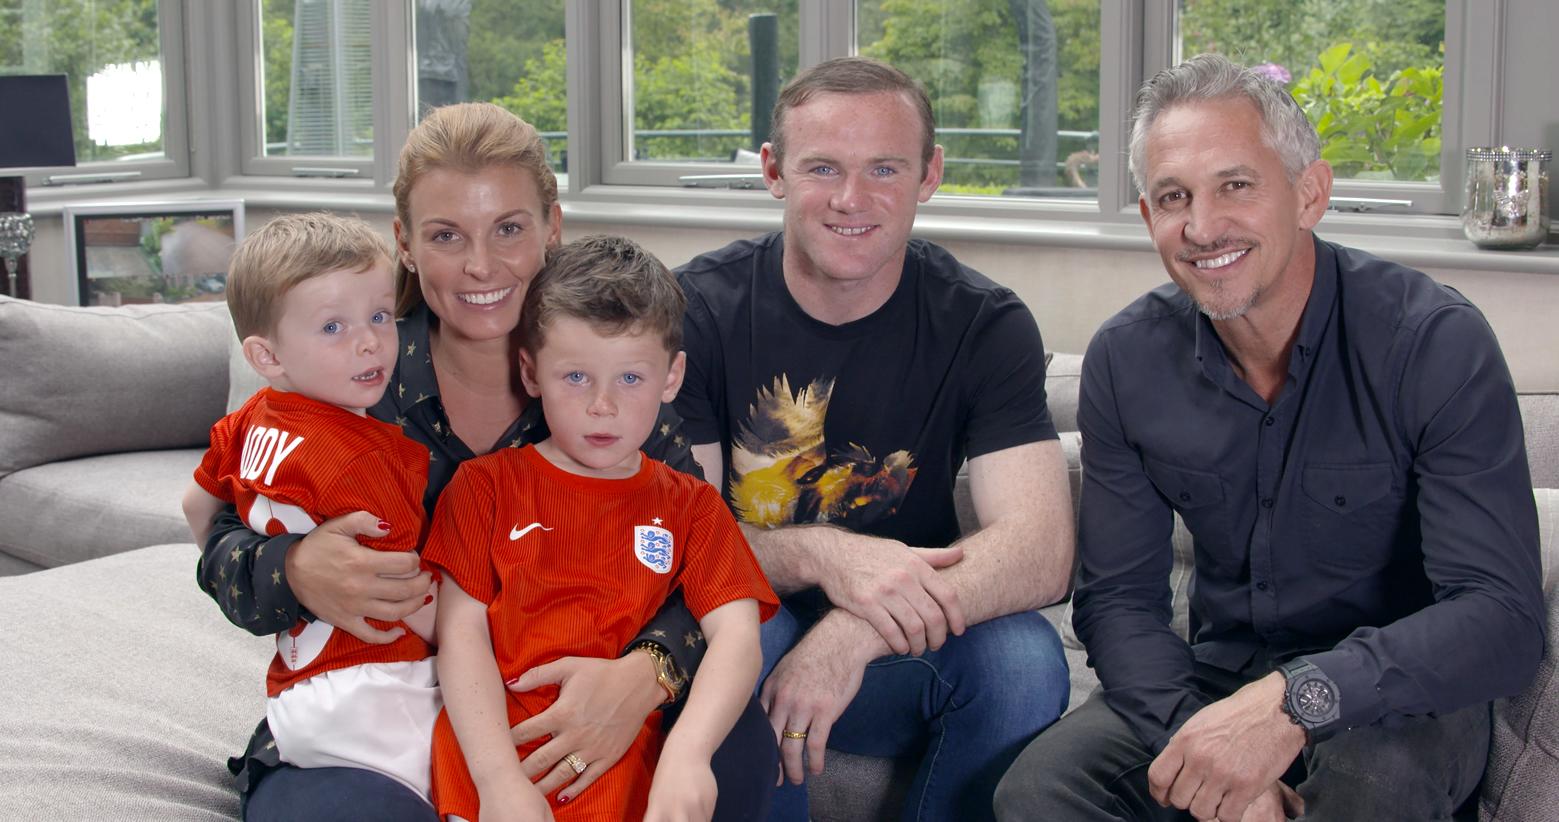 Behind the scenes with England's greatest goalscorer - Wayne Rooney